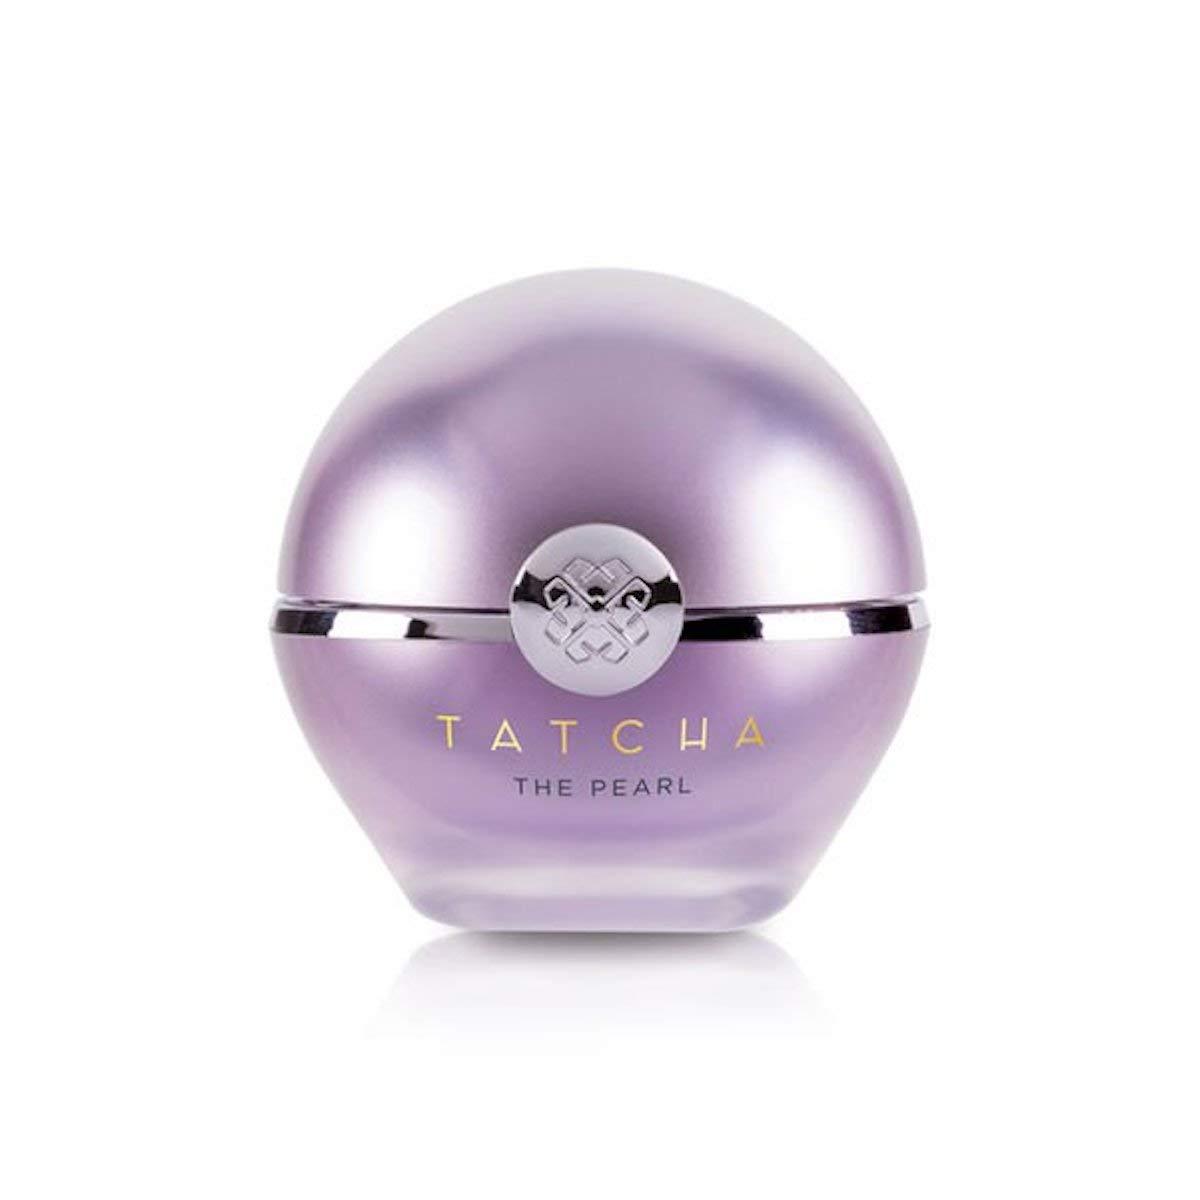 Tatcha The Pearl Tinted Eye Illuminating Treatment in Softlight - 13 milliliters / 0.4 ounces